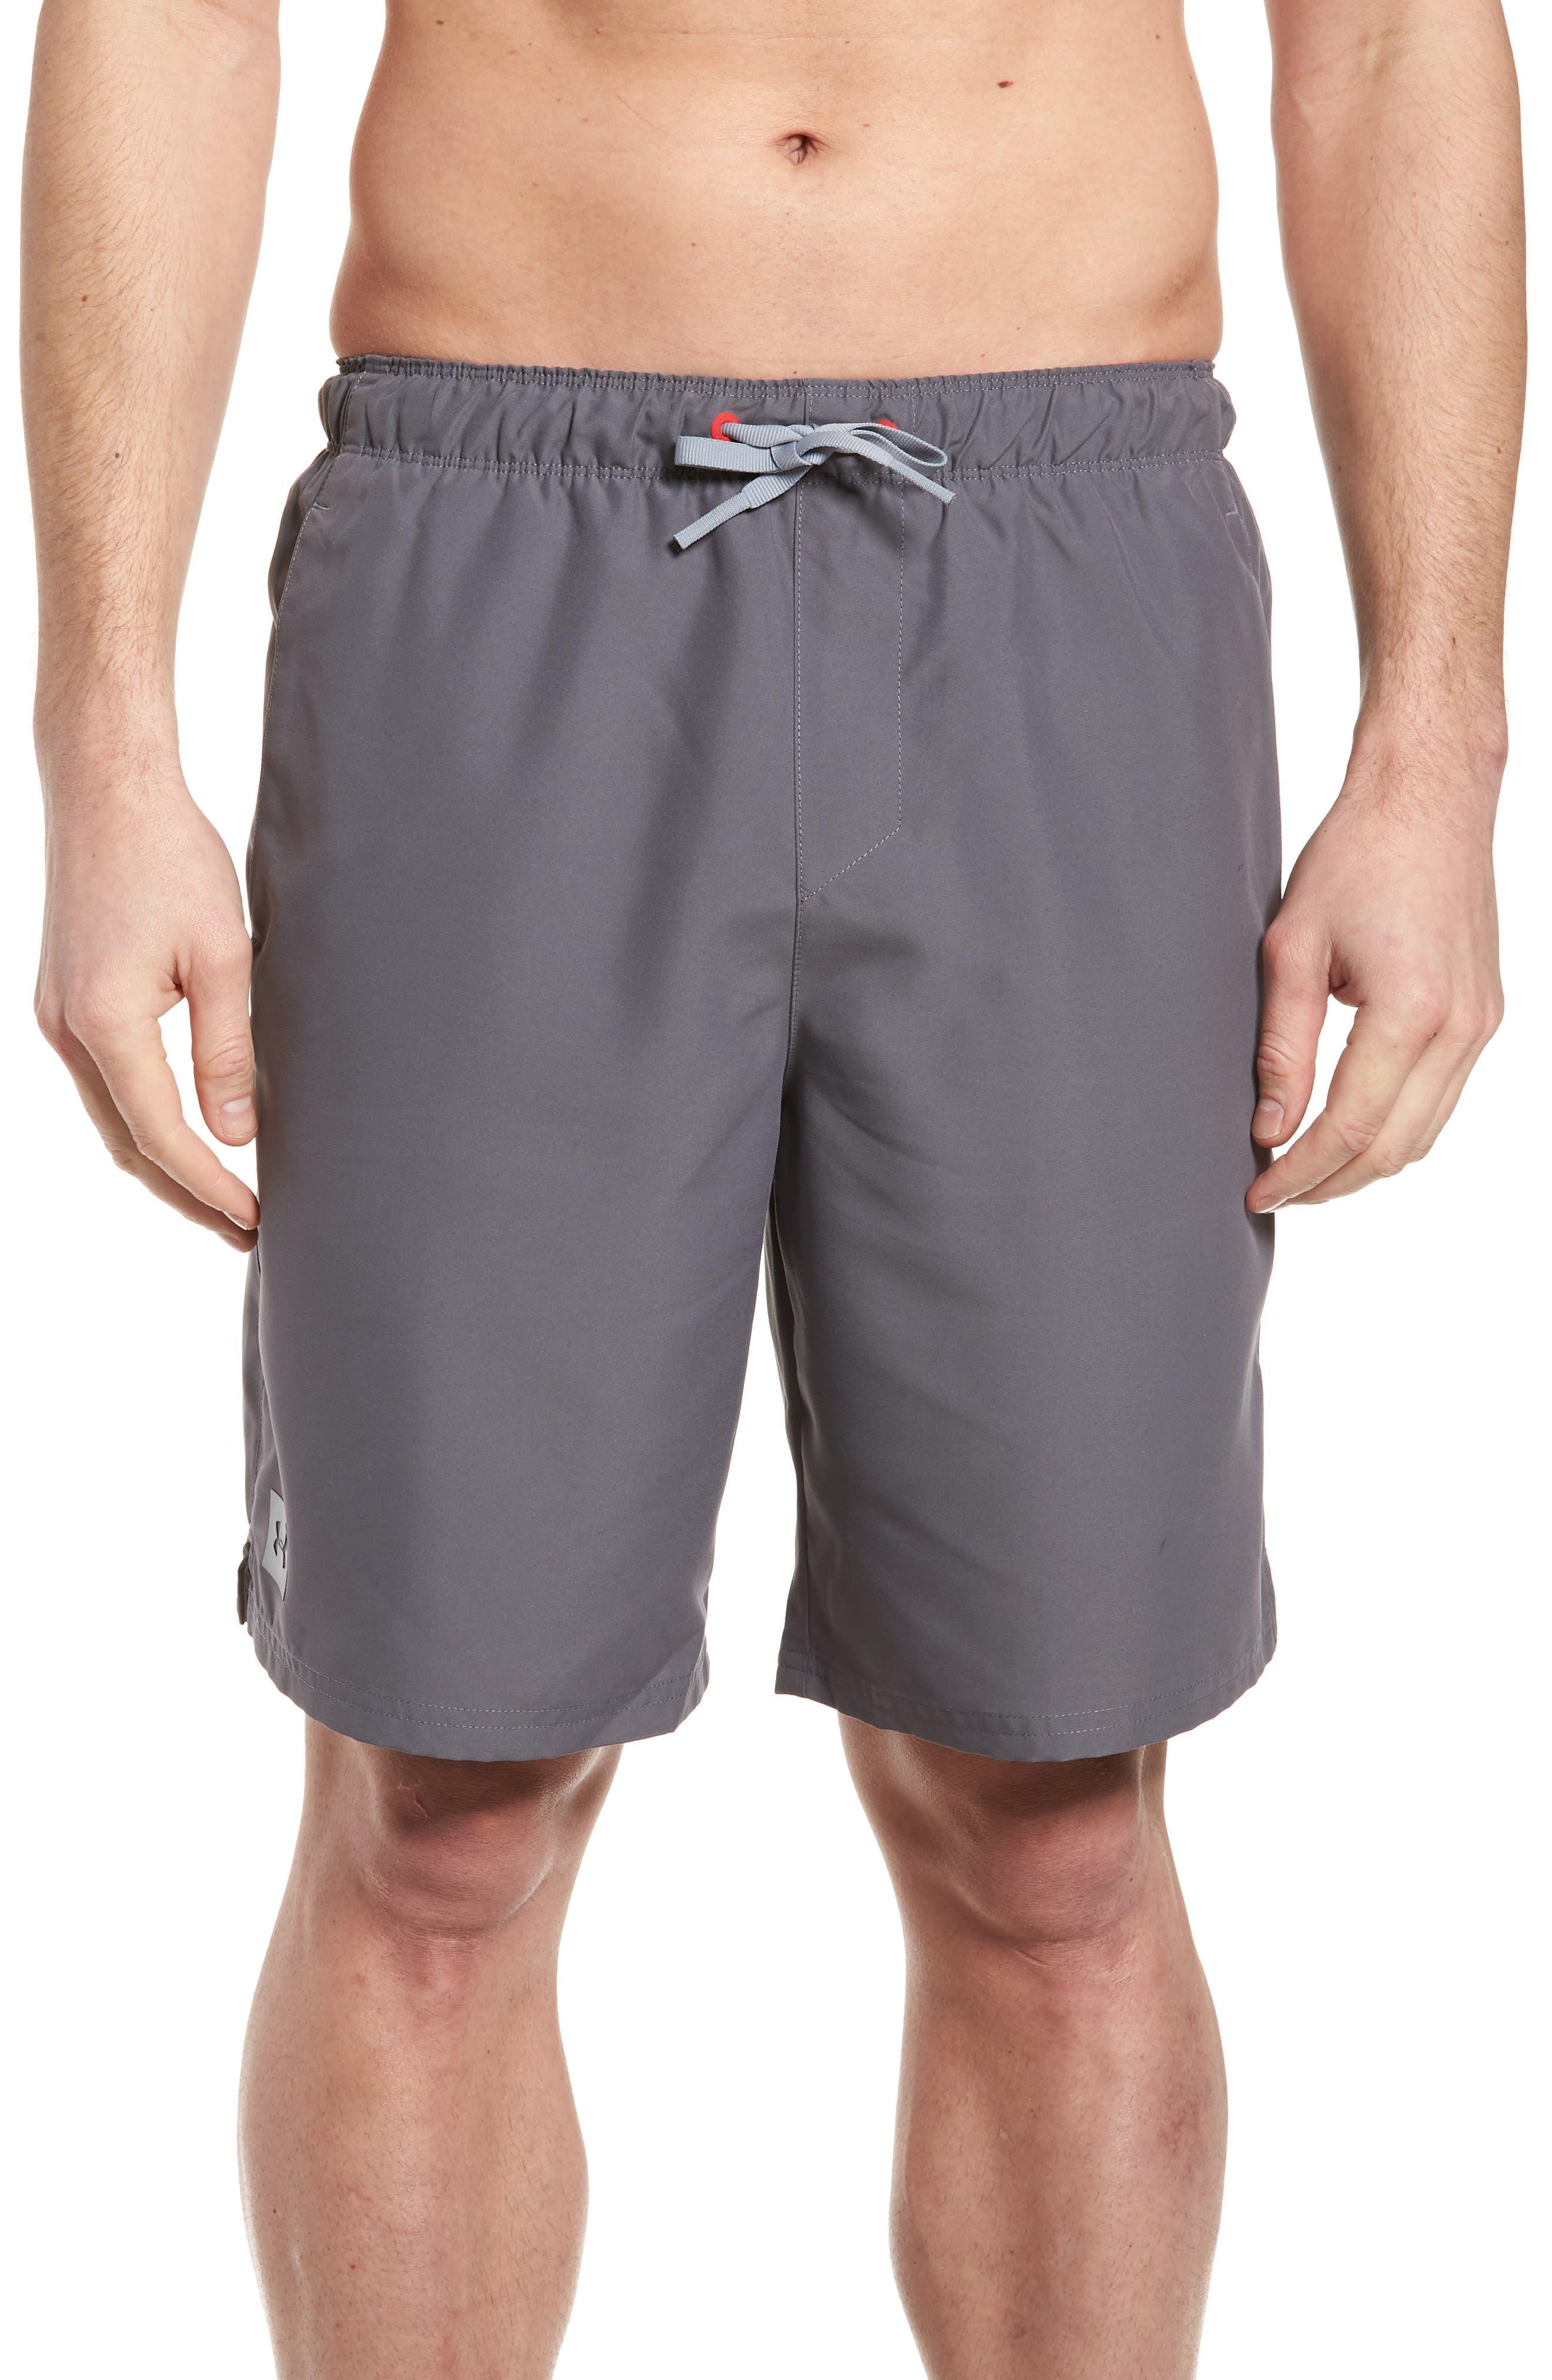 Mania Athletic Shorts,                         Main,                         color, Graphite / Pierce / Grey